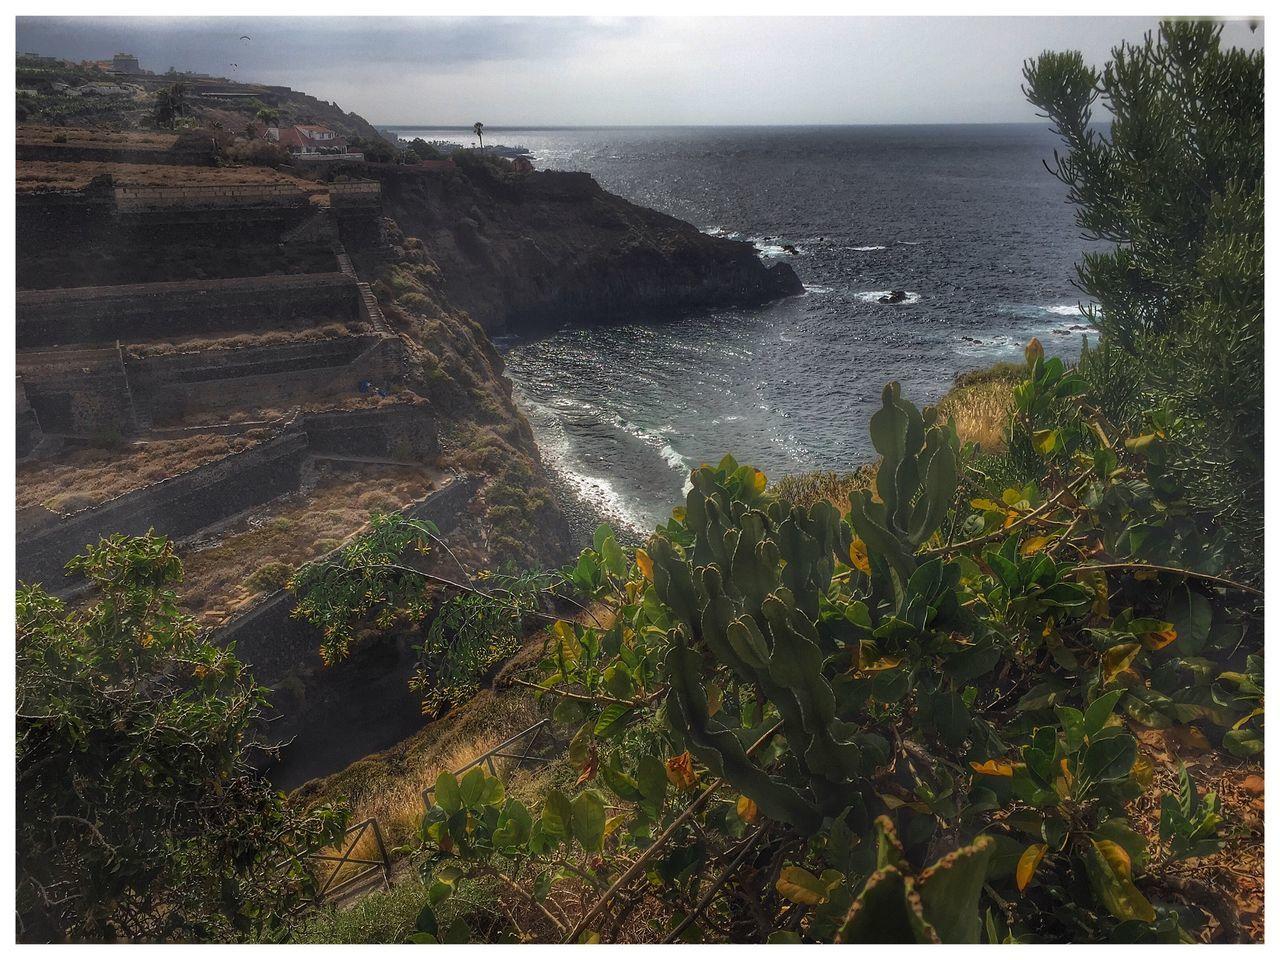 A Bird's Eye View Cliff Sea Sky No People Ocean Palm Trees Cactus